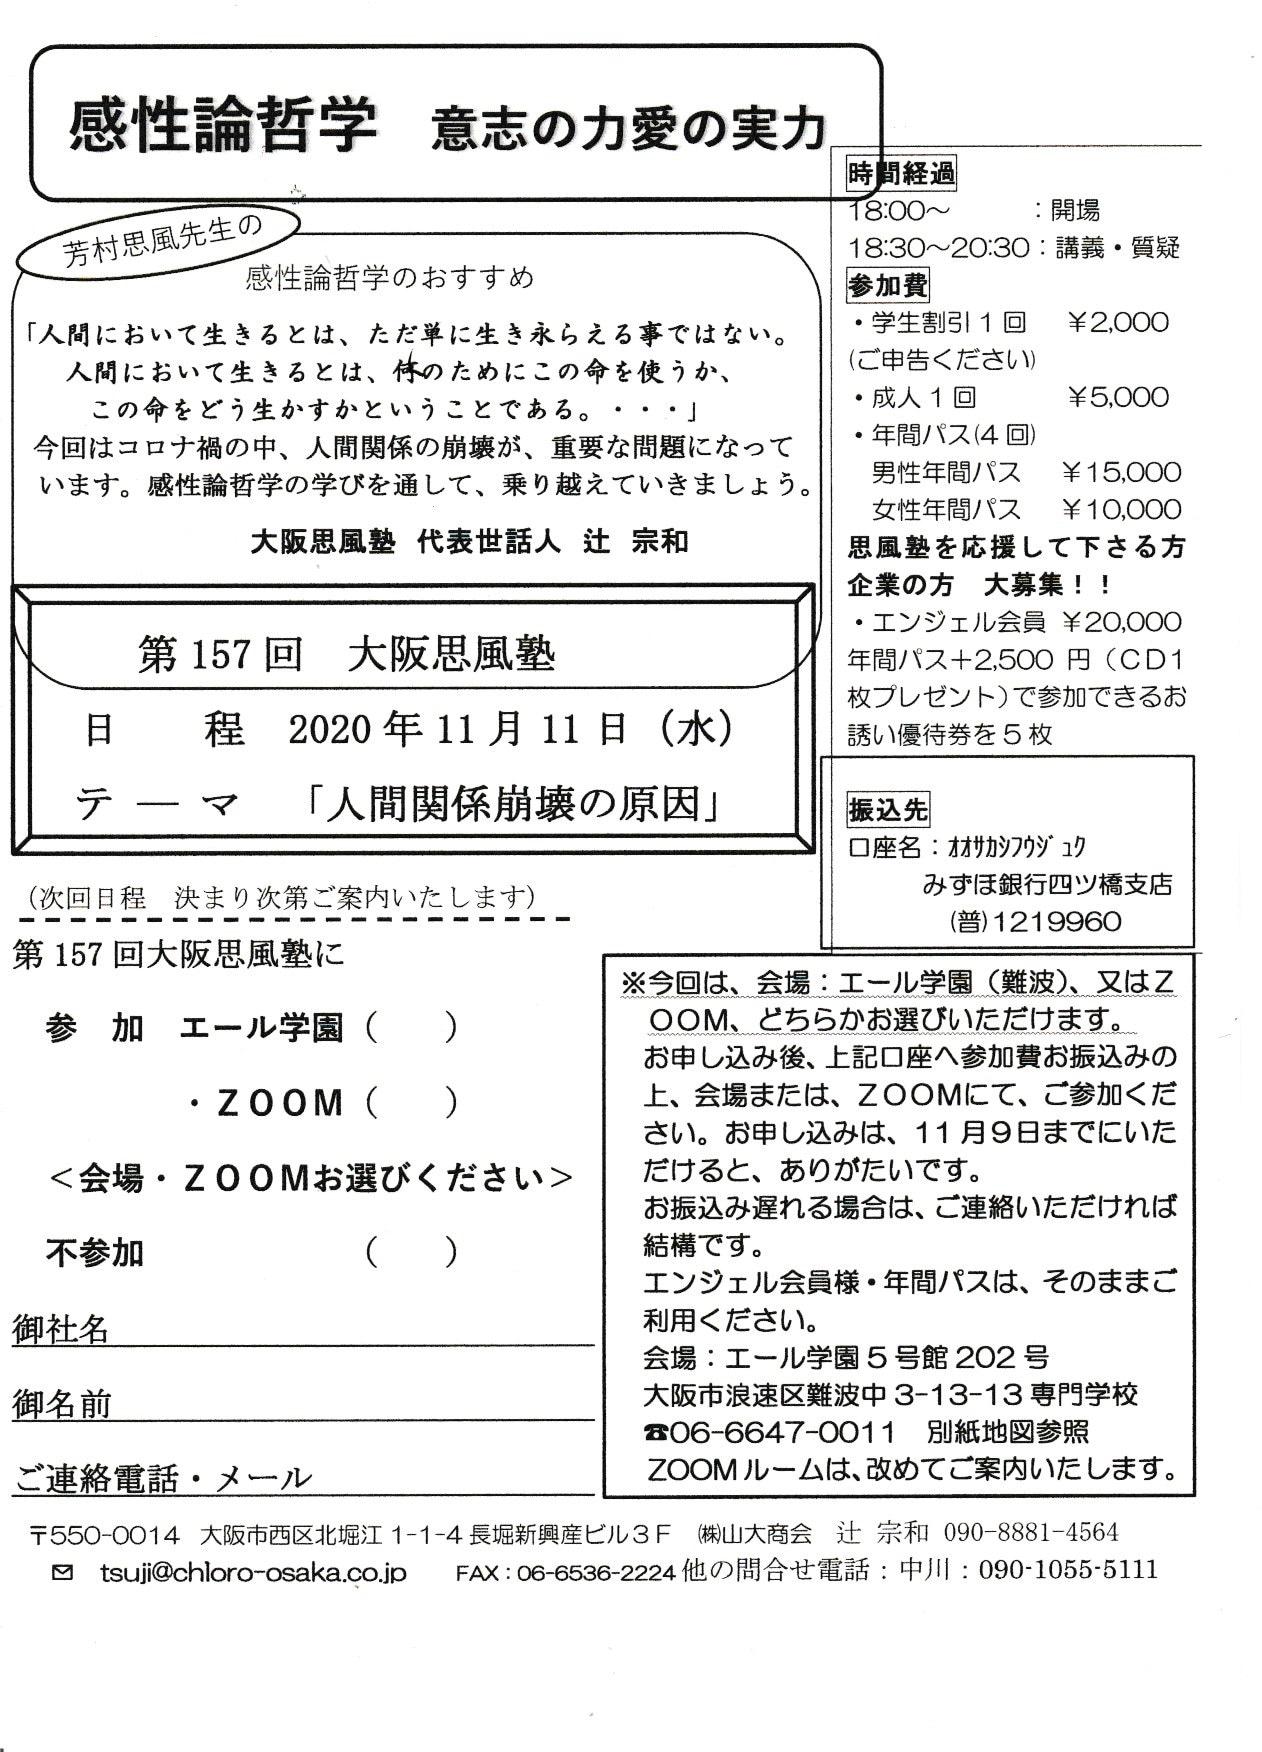 o1262175214837175436 - 11月11日(水)大阪思風塾のご案内